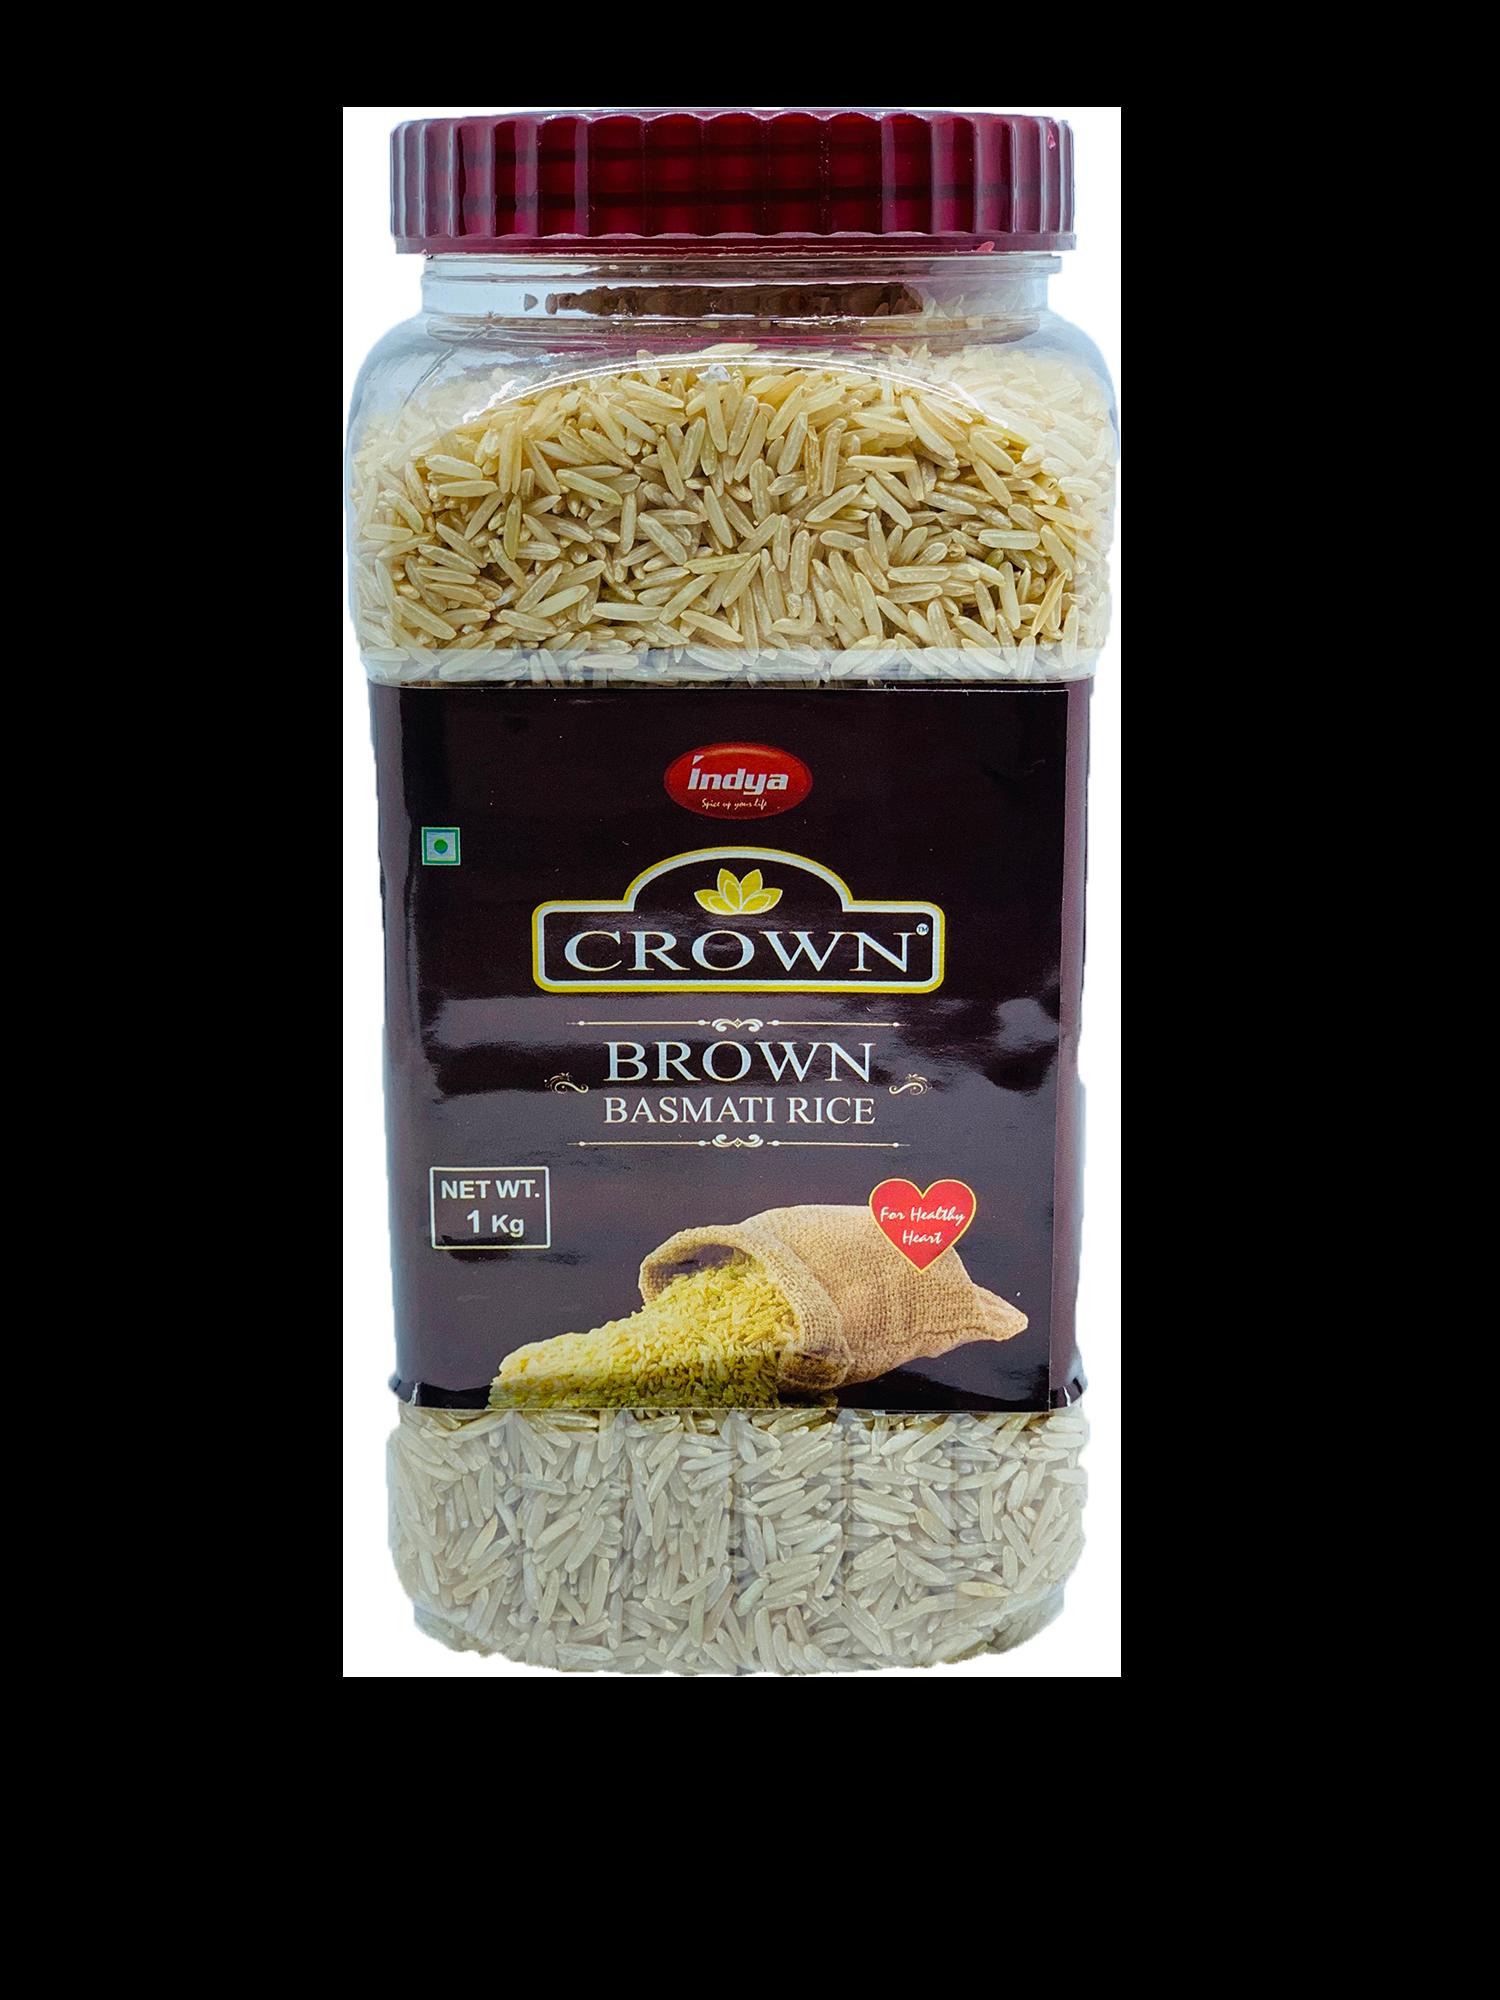 basmati rice 5 kg by indya brand